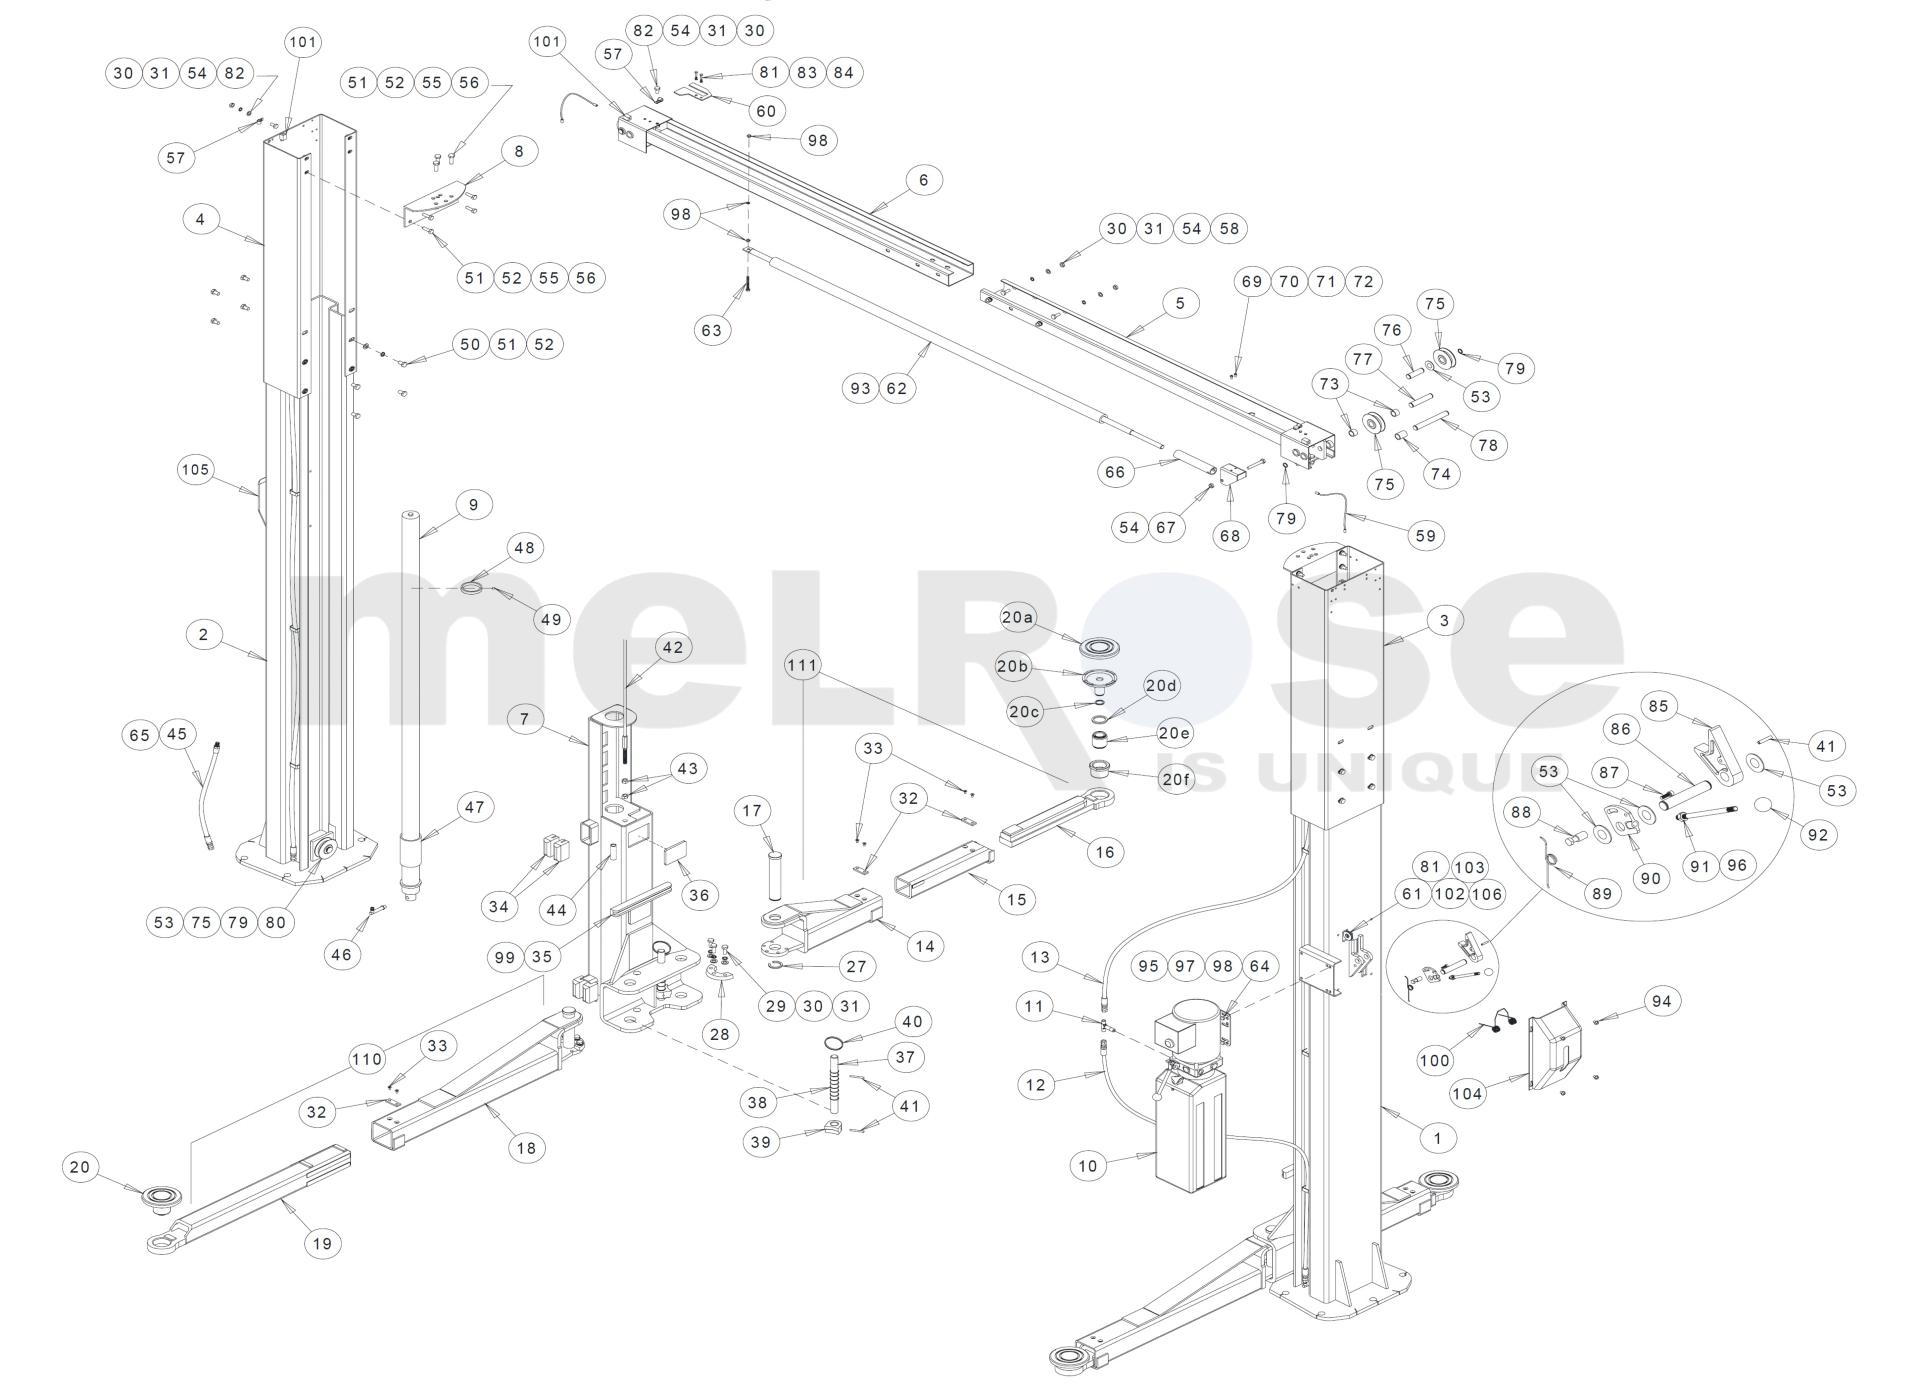 sa10-complete-diagram-markedii.jpg